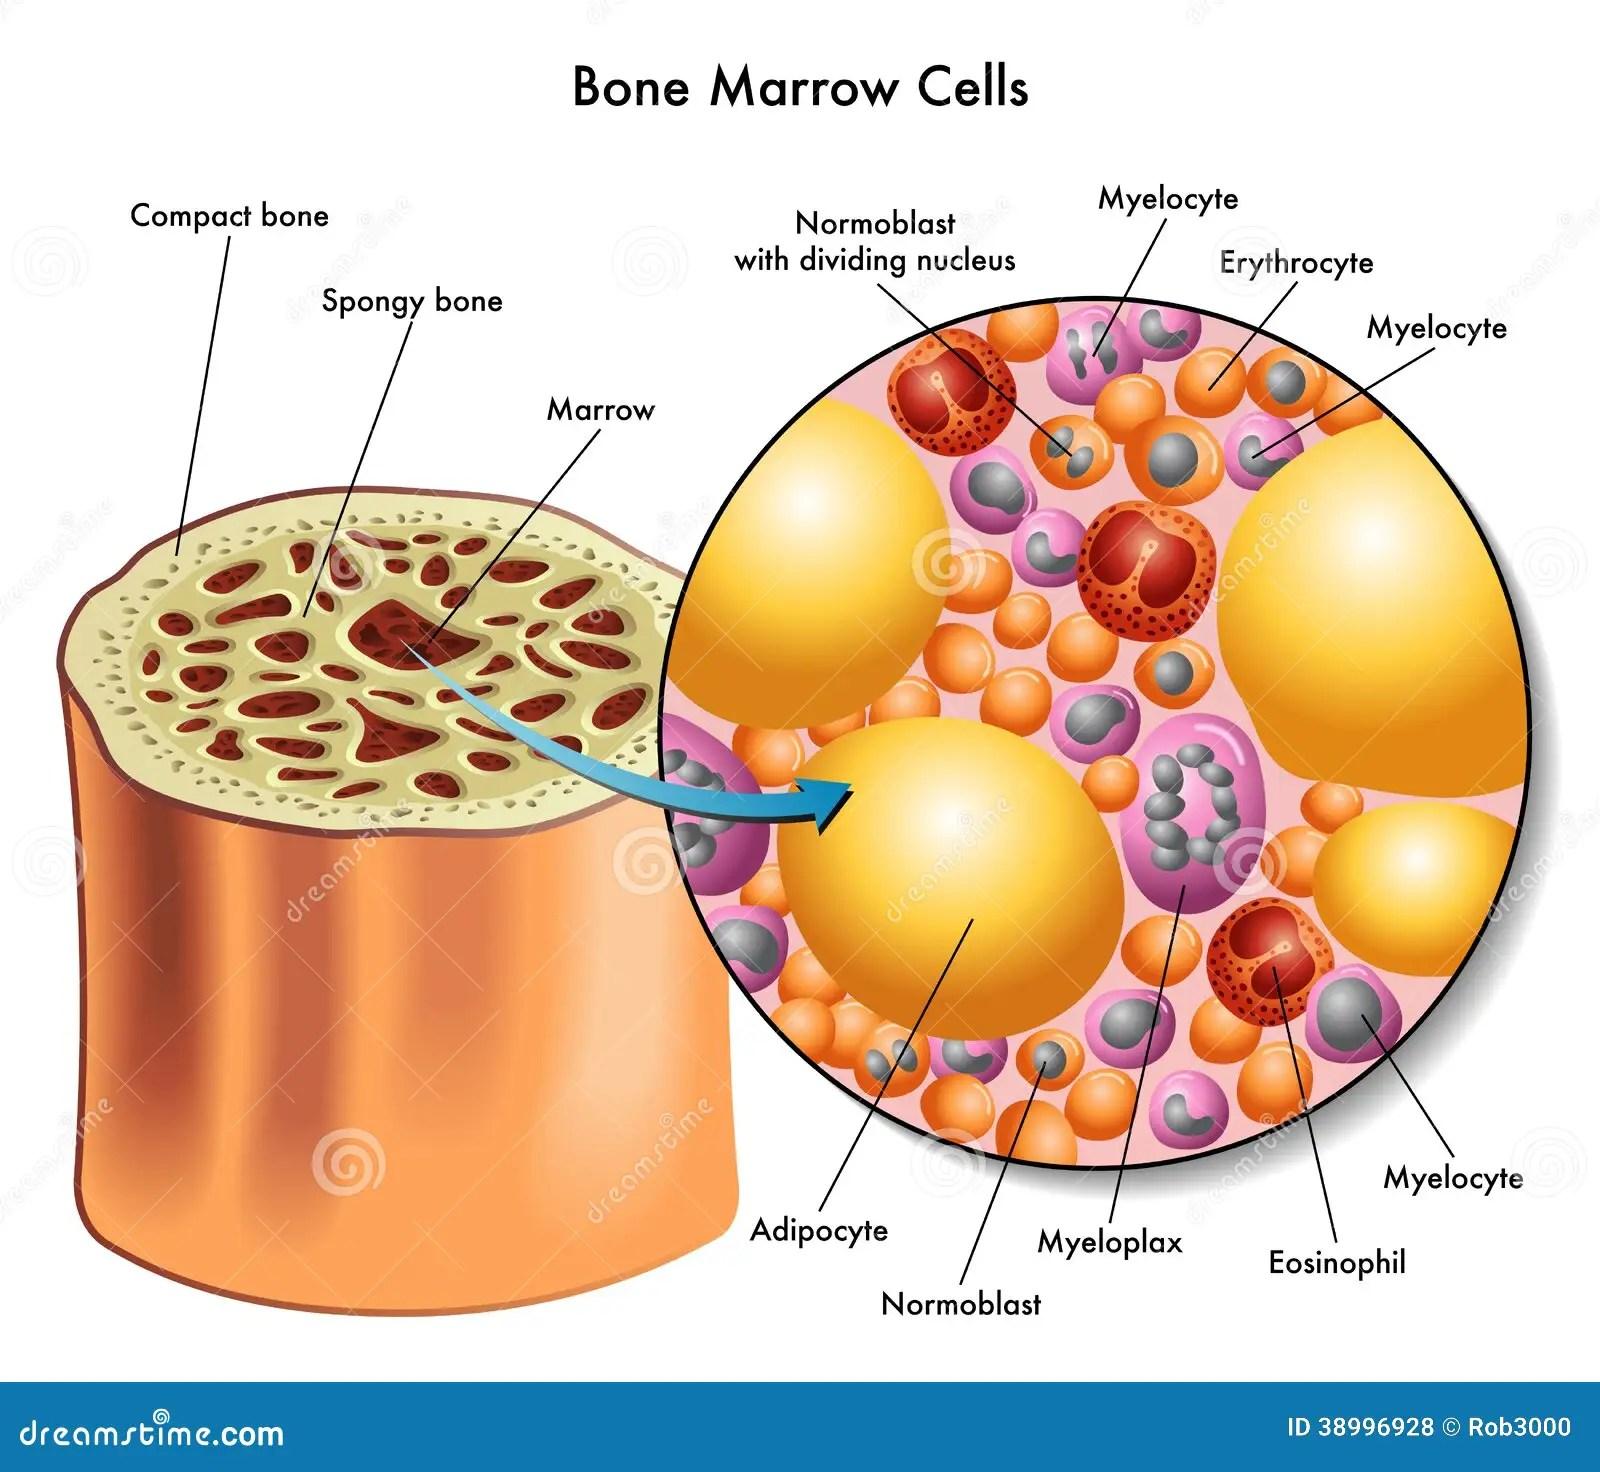 bone marrow cell diagram vw golf vr6 wiring cells stock vector image 38996928